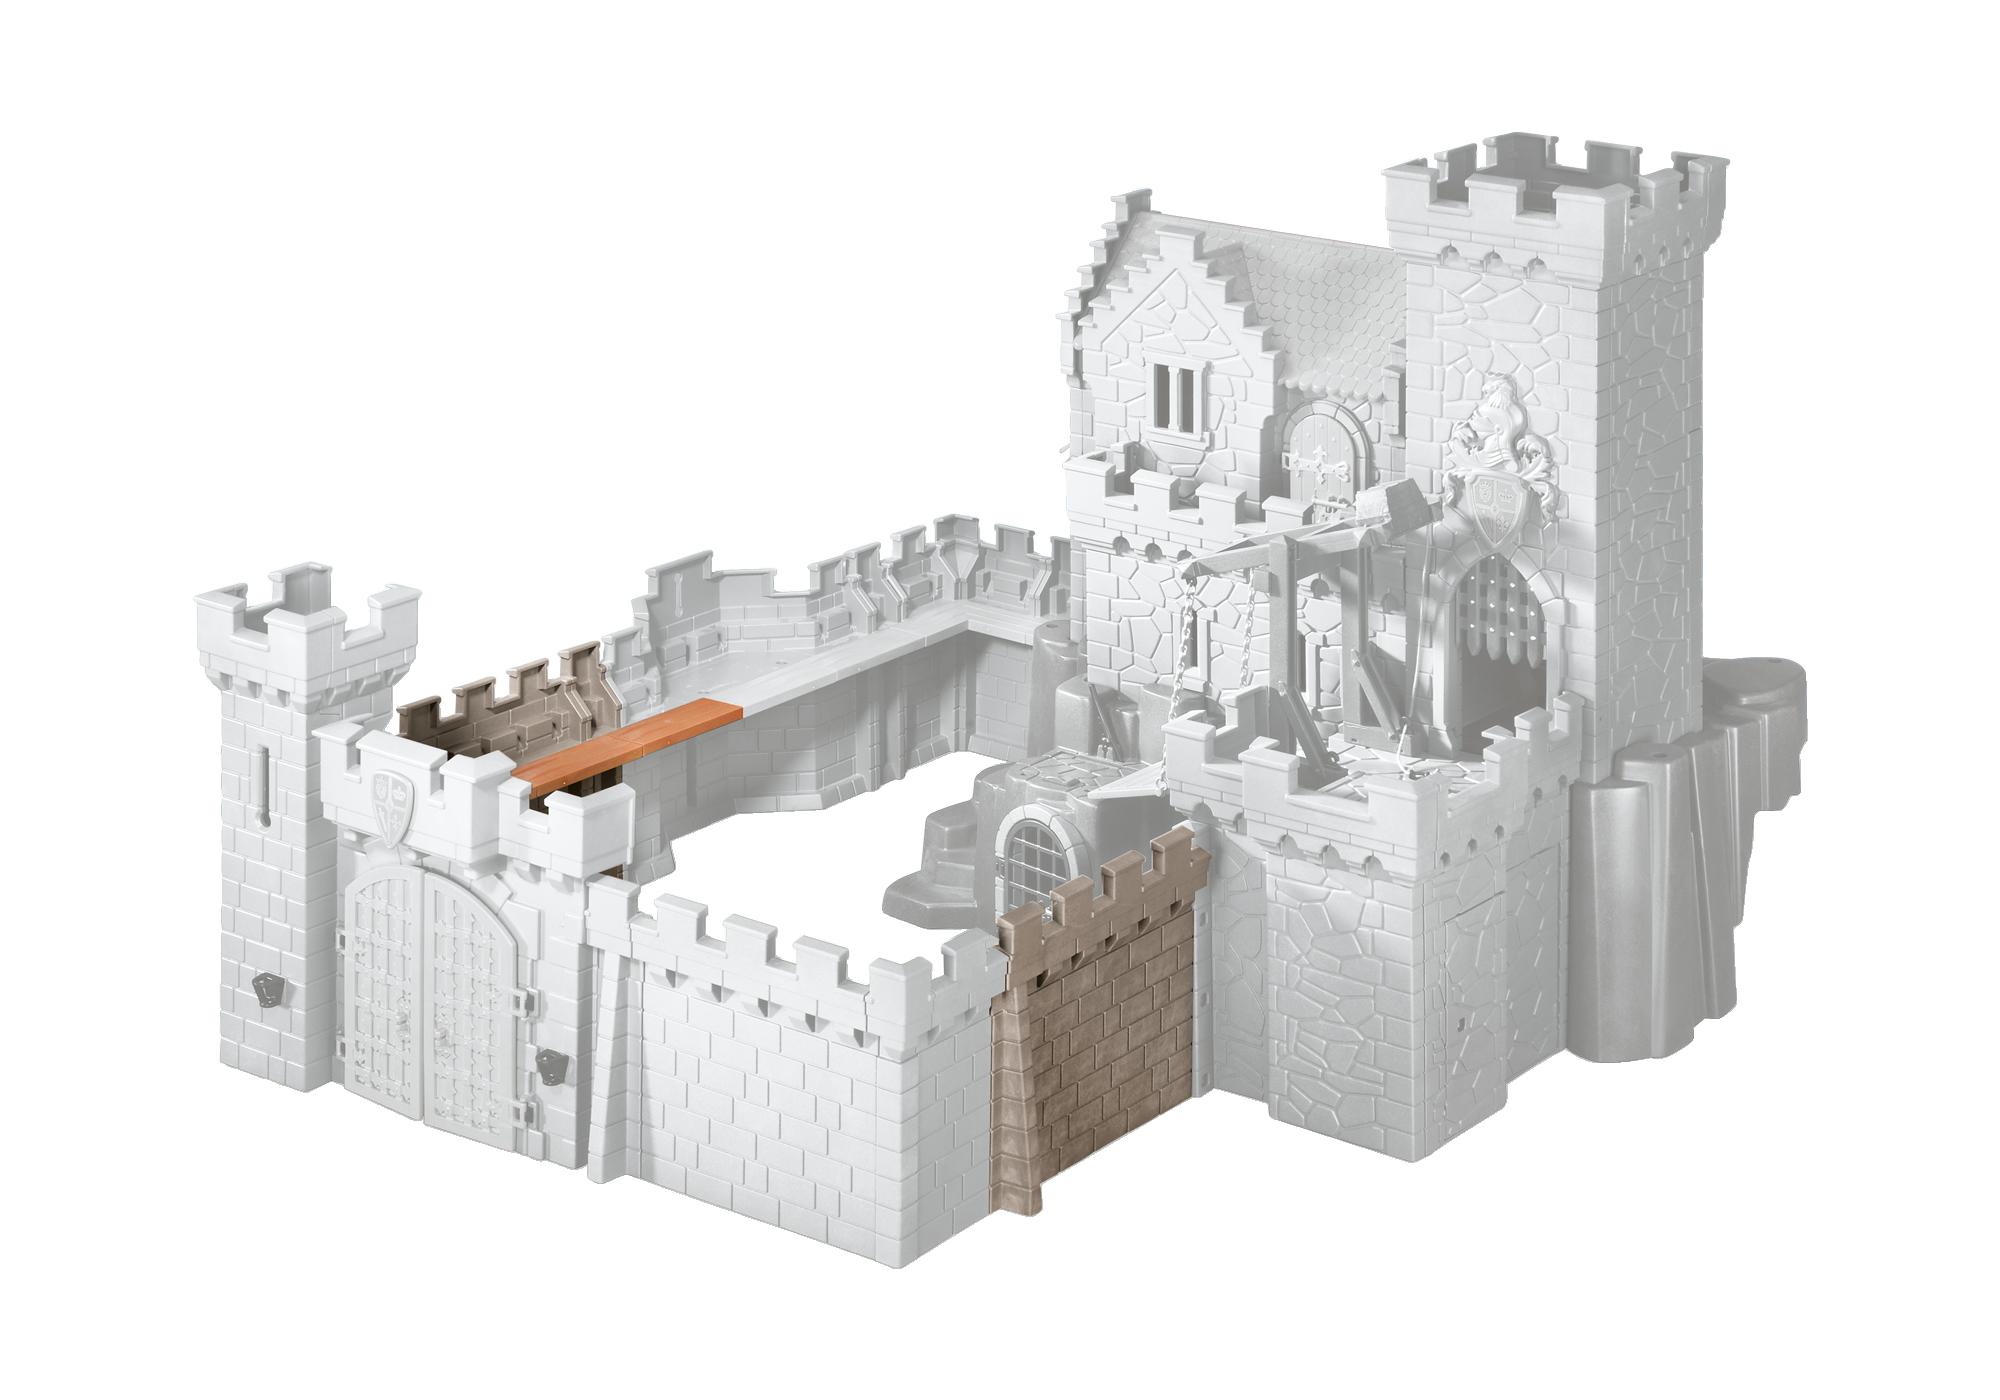 http://media.playmobil.com/i/playmobil/6371_product_detail/Extensión de Pared para el Castillo de los Caballeros Reales del